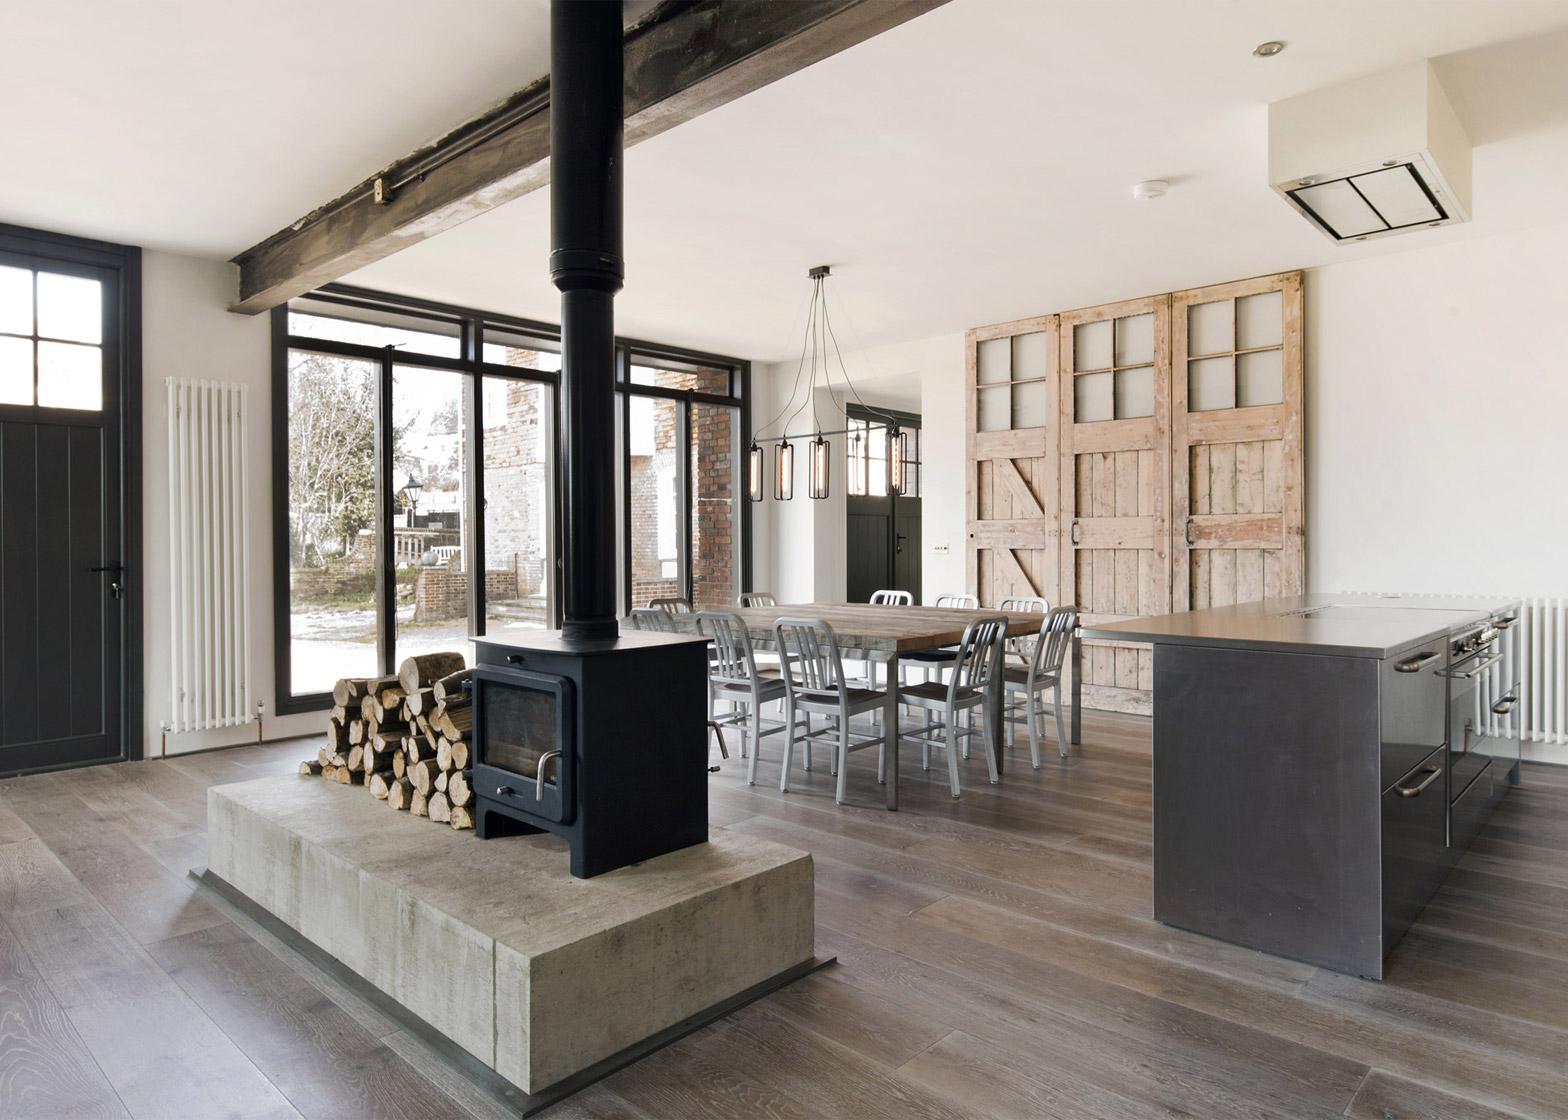 architecture_ambulance_house__design_studia_interiors_osnovadesign_osnova_poltava_02